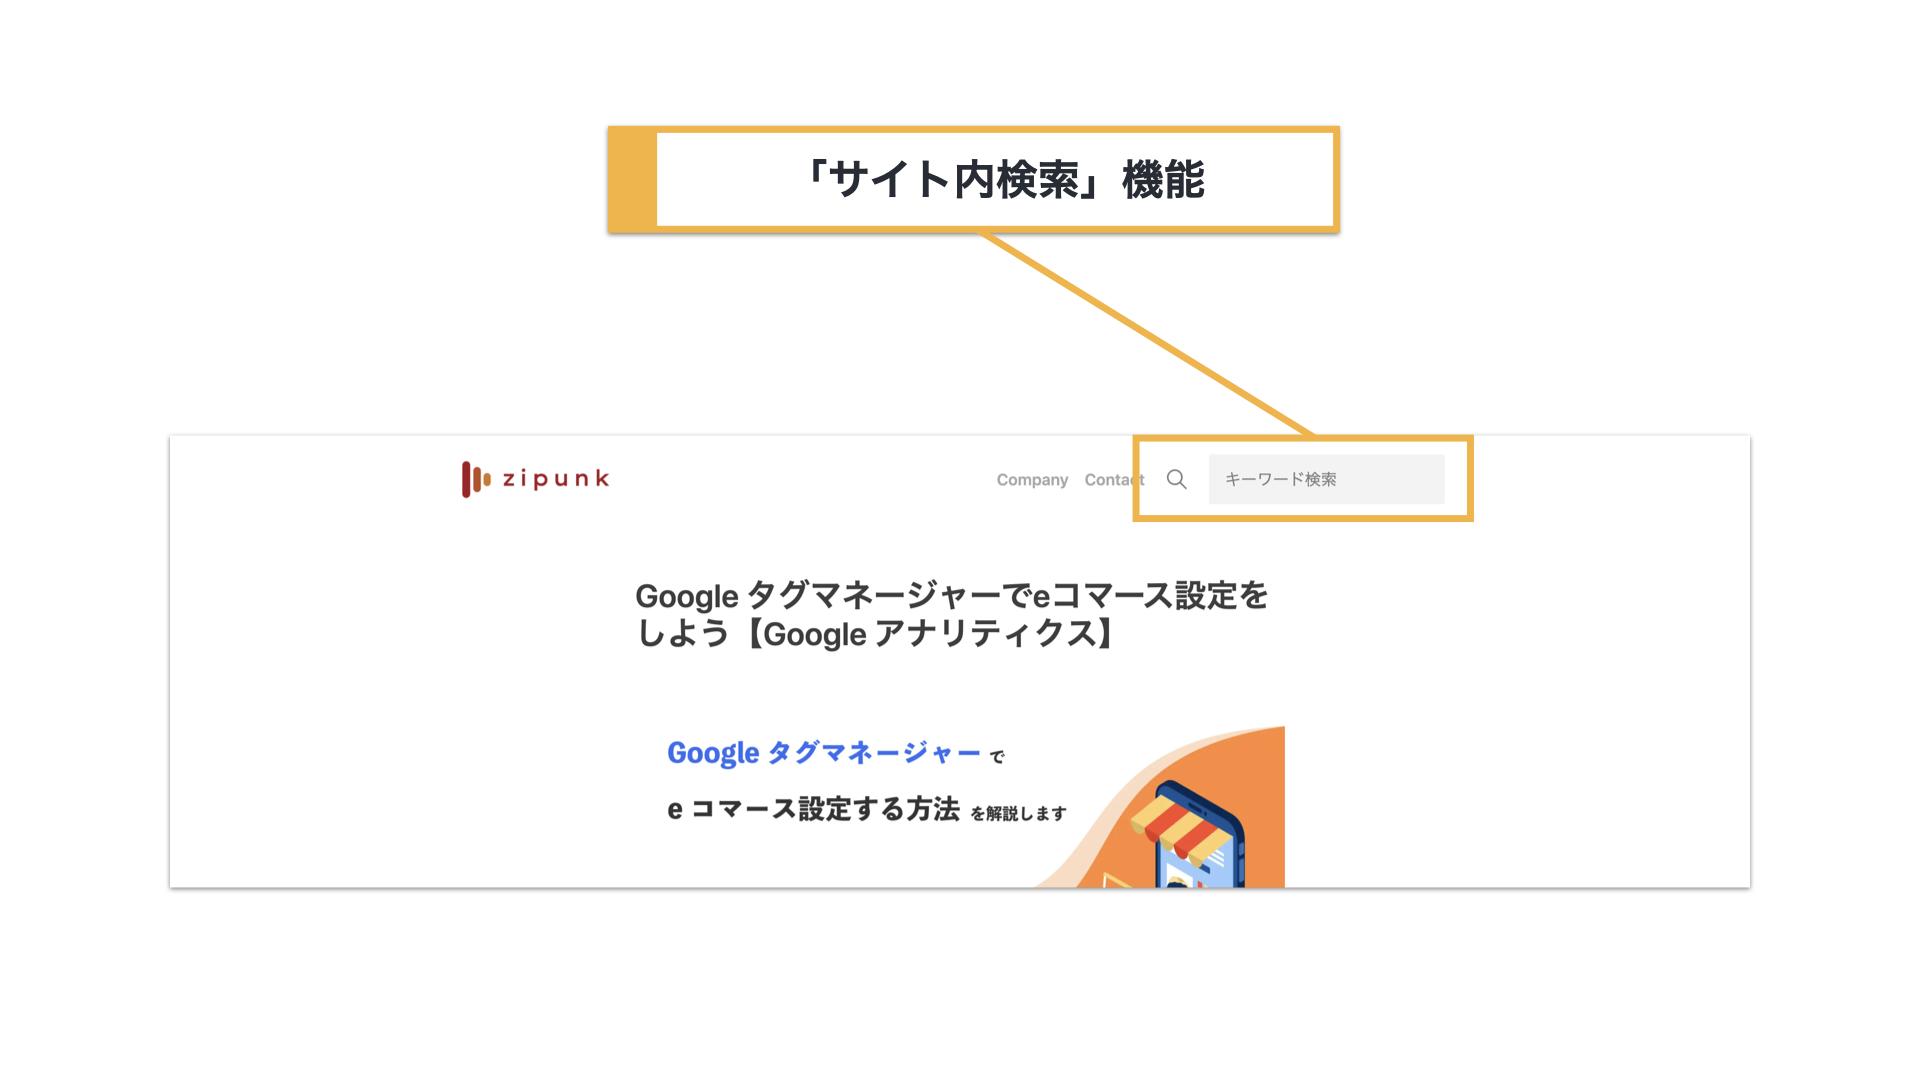 site-serach-example